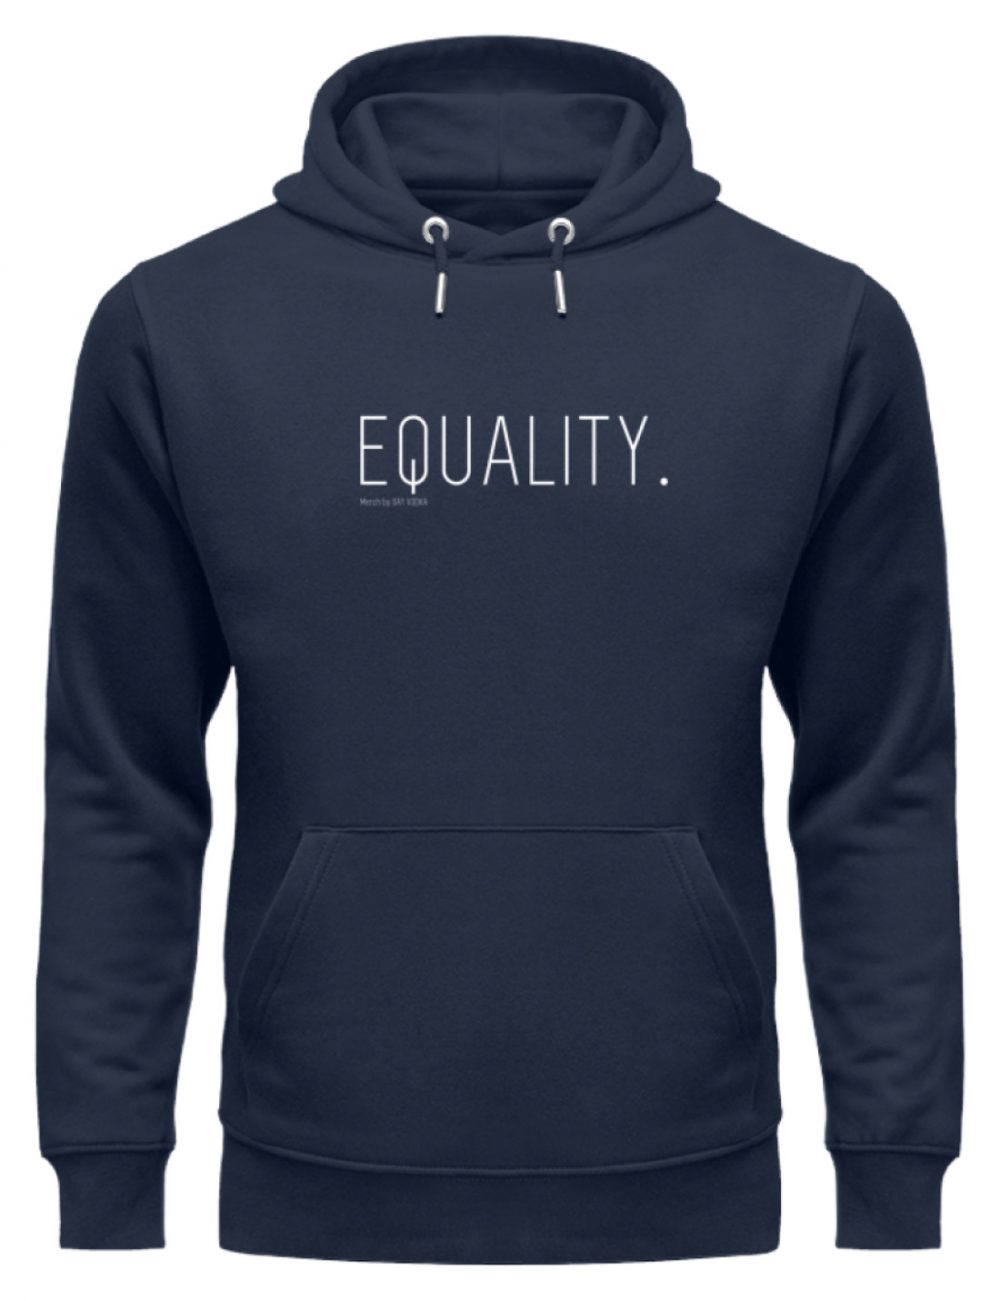 EQUALITY. - Unisex Organic Hoodie-6887